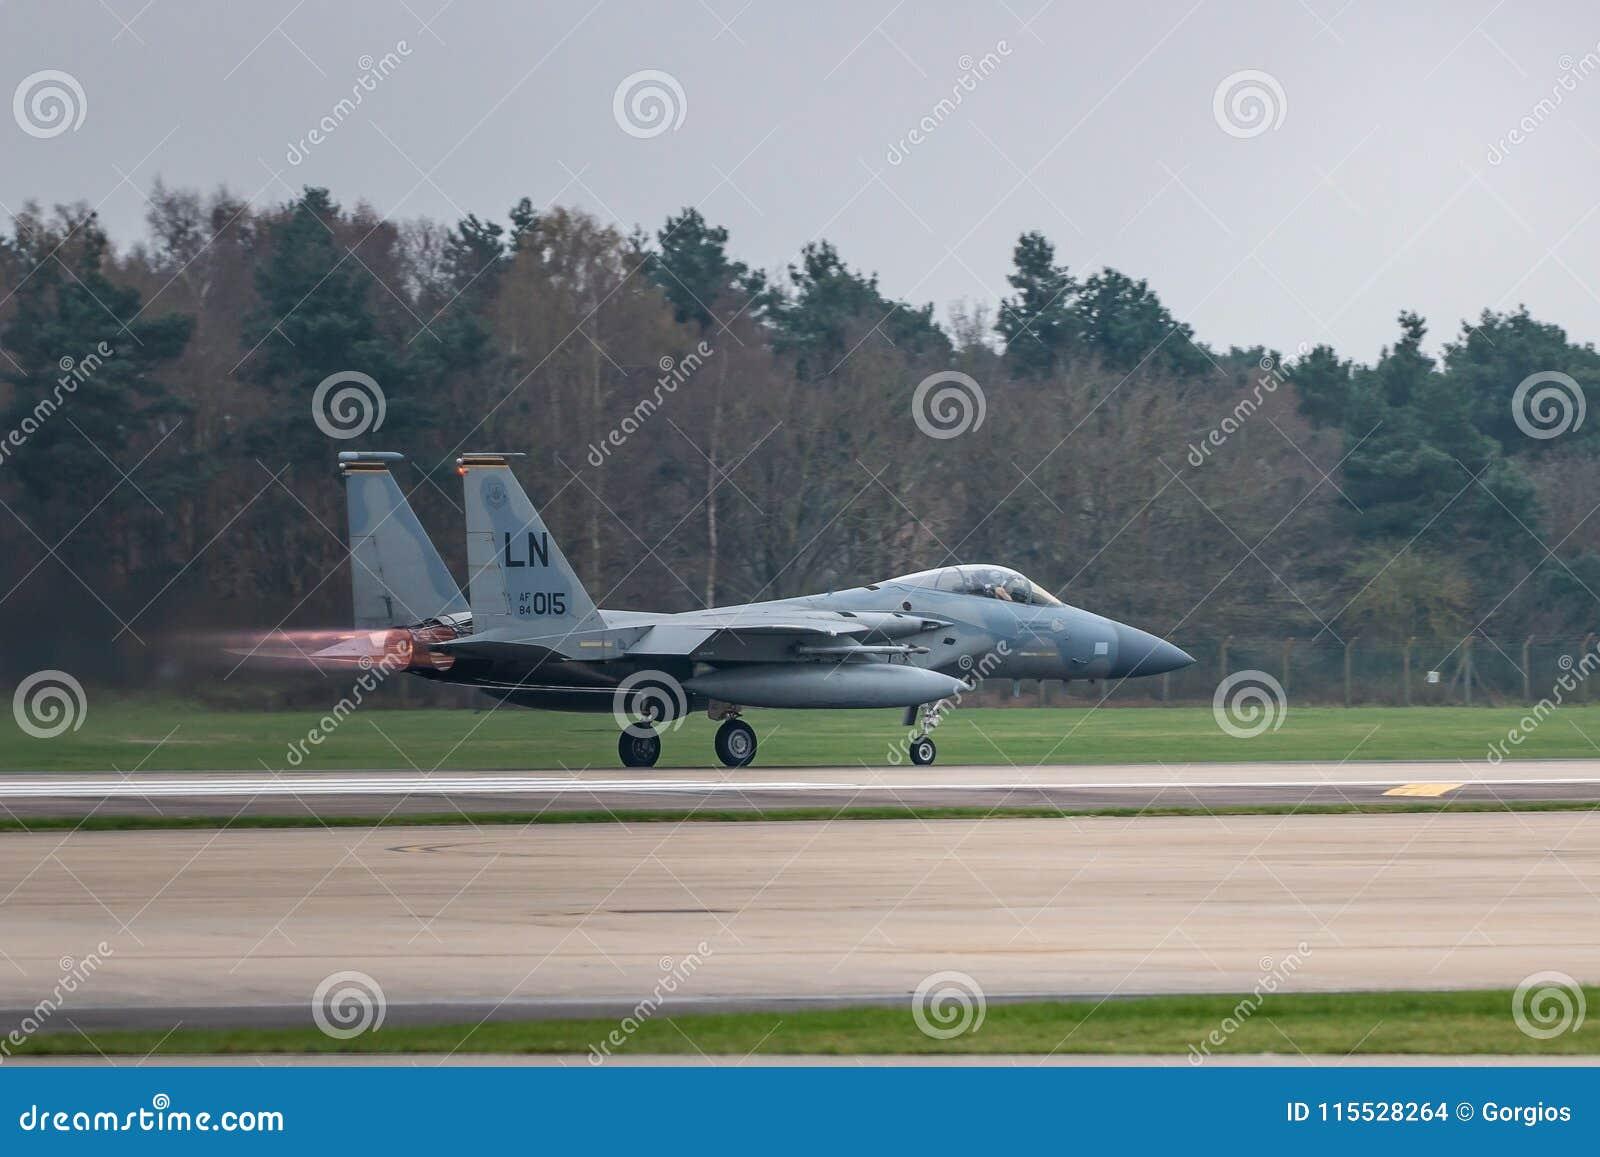 O U.S.A.F. de RAF Lakenheath F-15 jorra